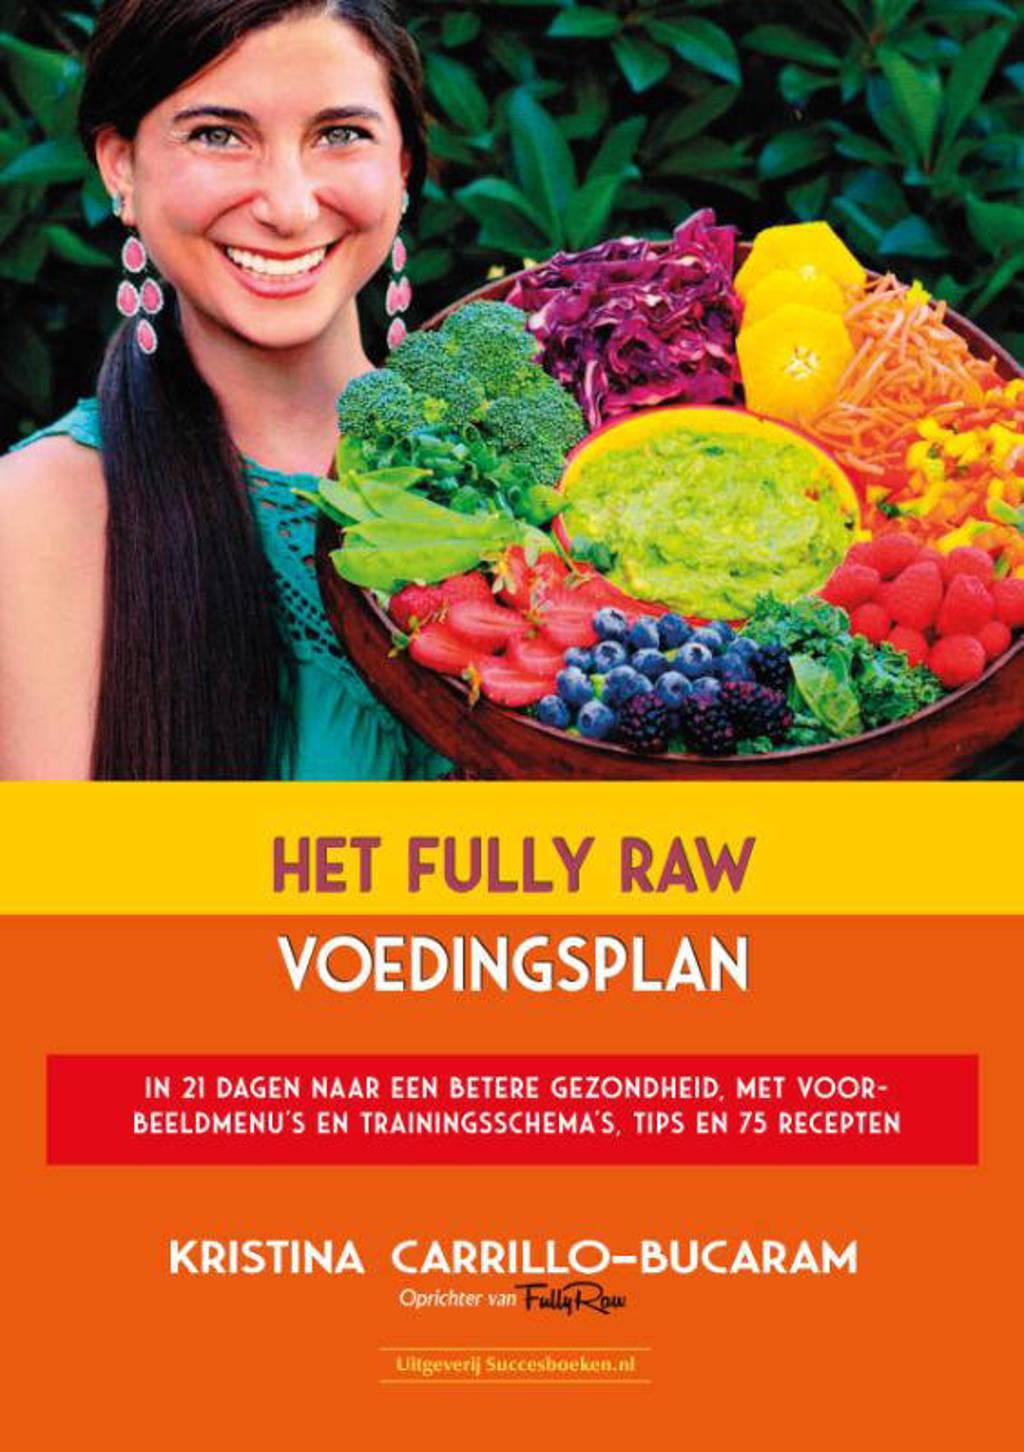 Het Fully Raw voedingsplan - Kristina Carrillo-Bucaram